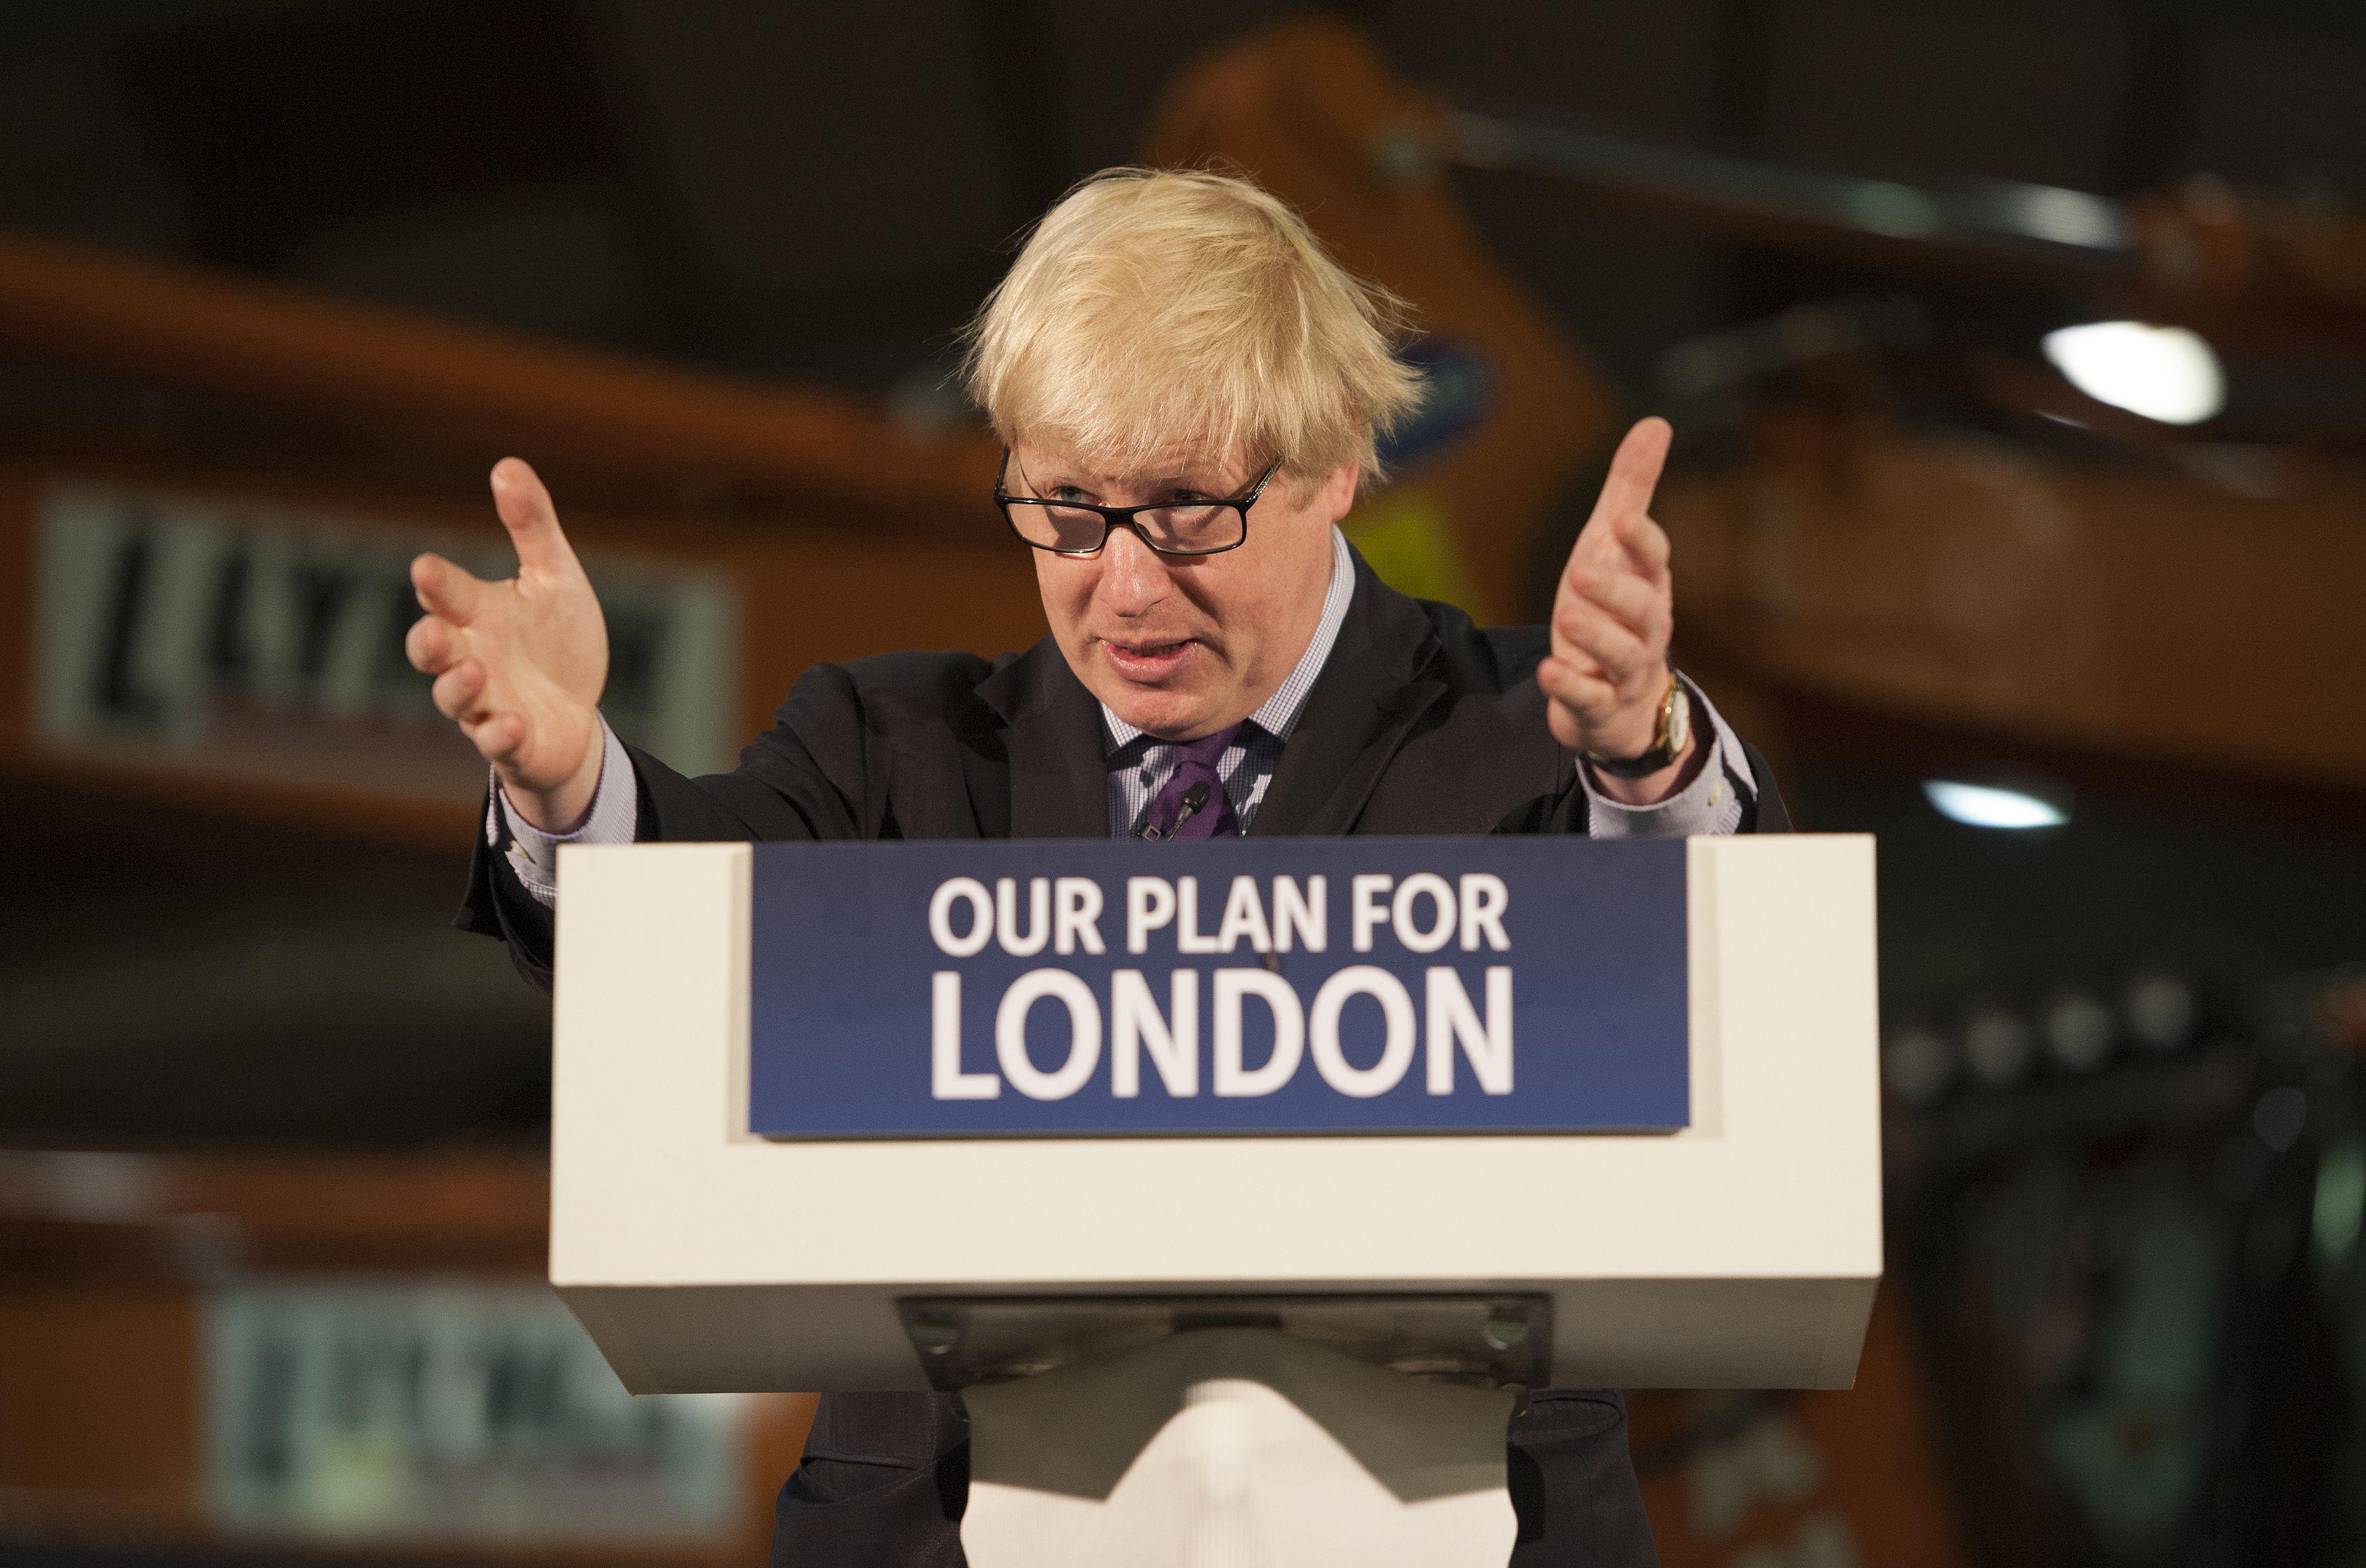 Mayor of London Boris Johnson speaks at Lynch Plant Hire Depot in North West London.